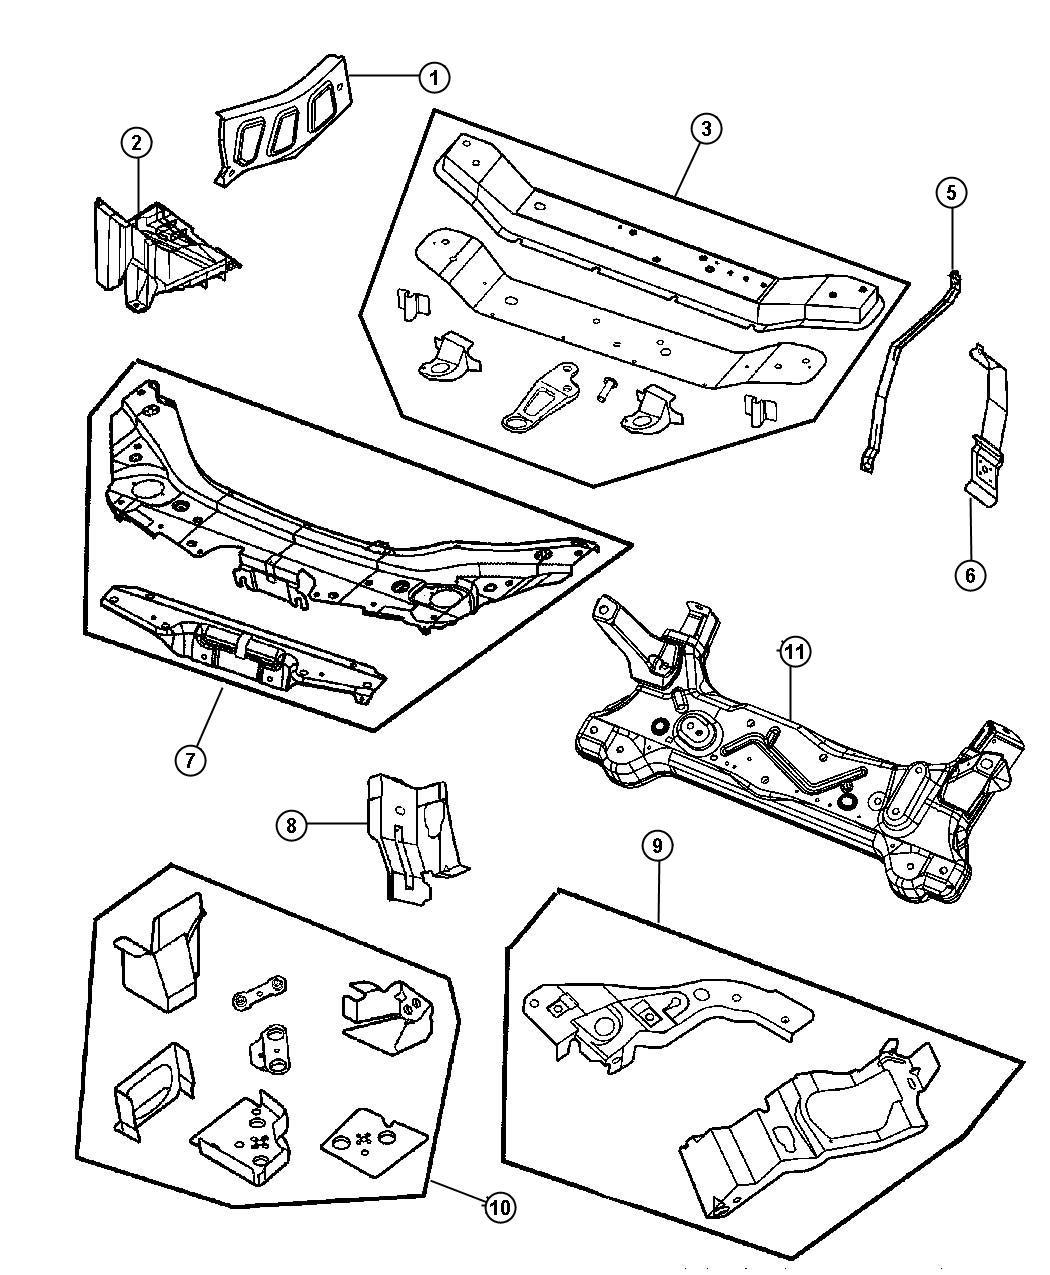 Chrysler Sebring Pin Push In M8 X 1 25 X 20 Fascia